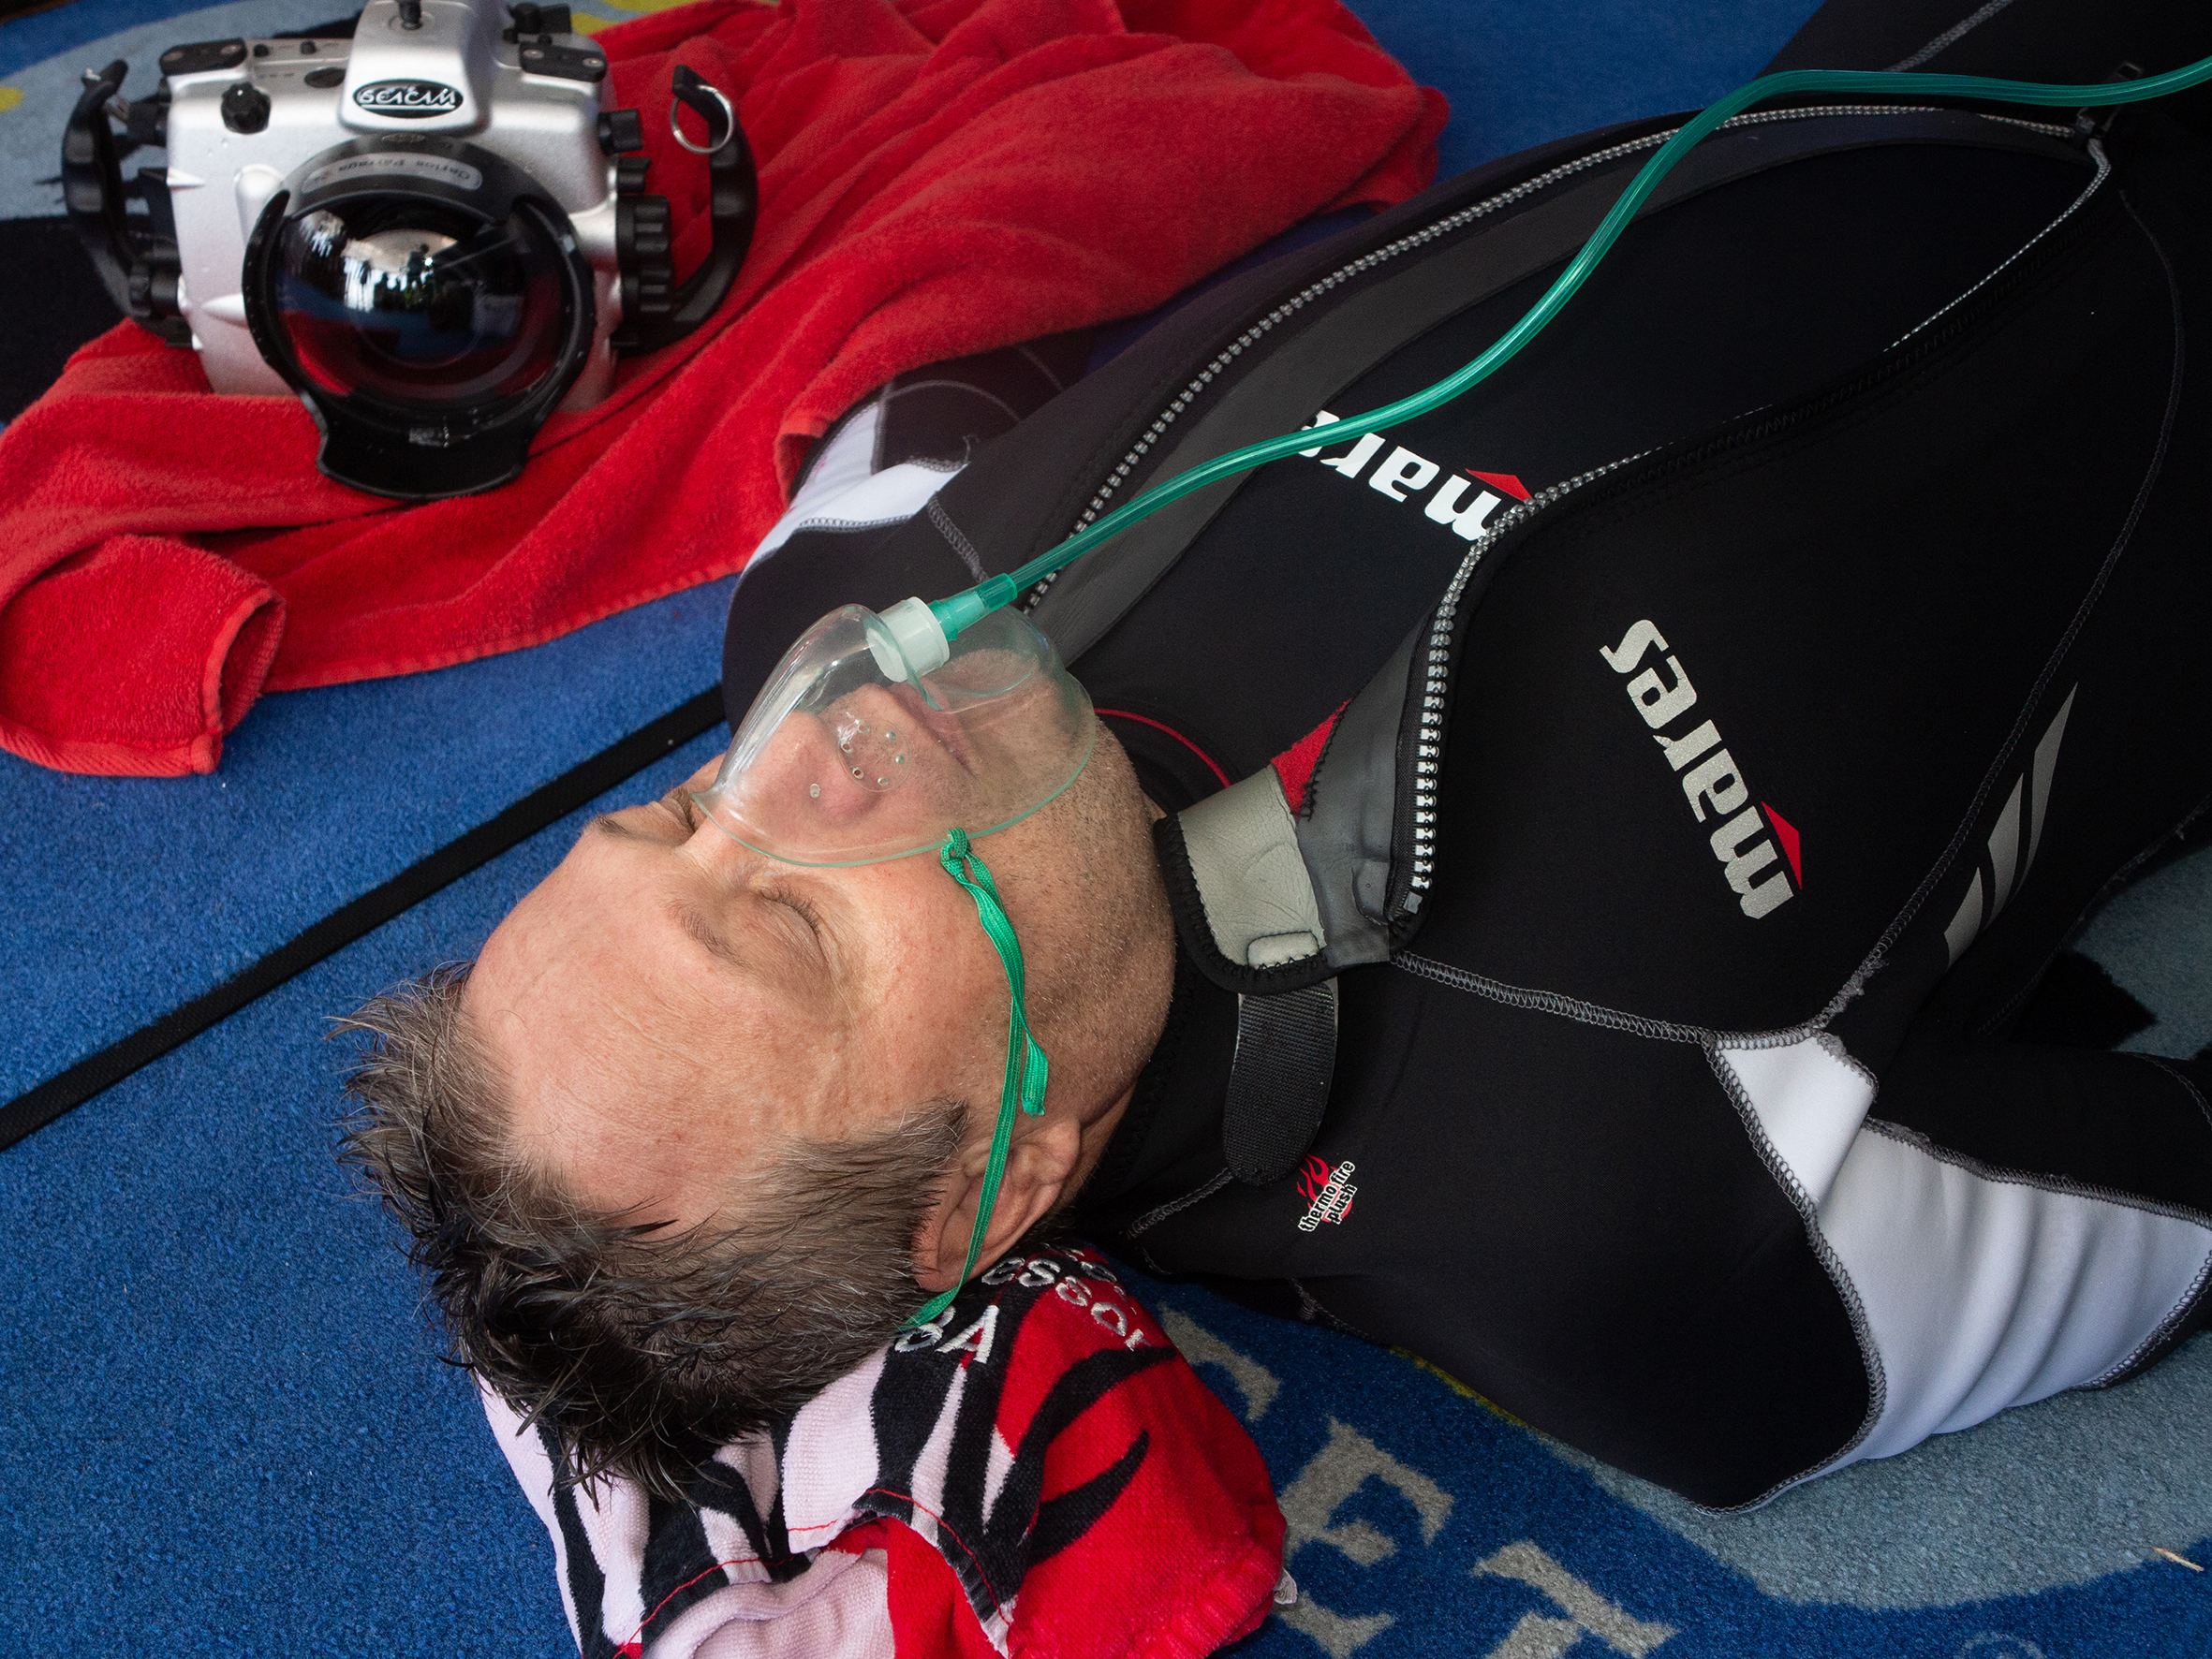 Scuba Diving Emergencies DCI, dehydration or a cardiac event